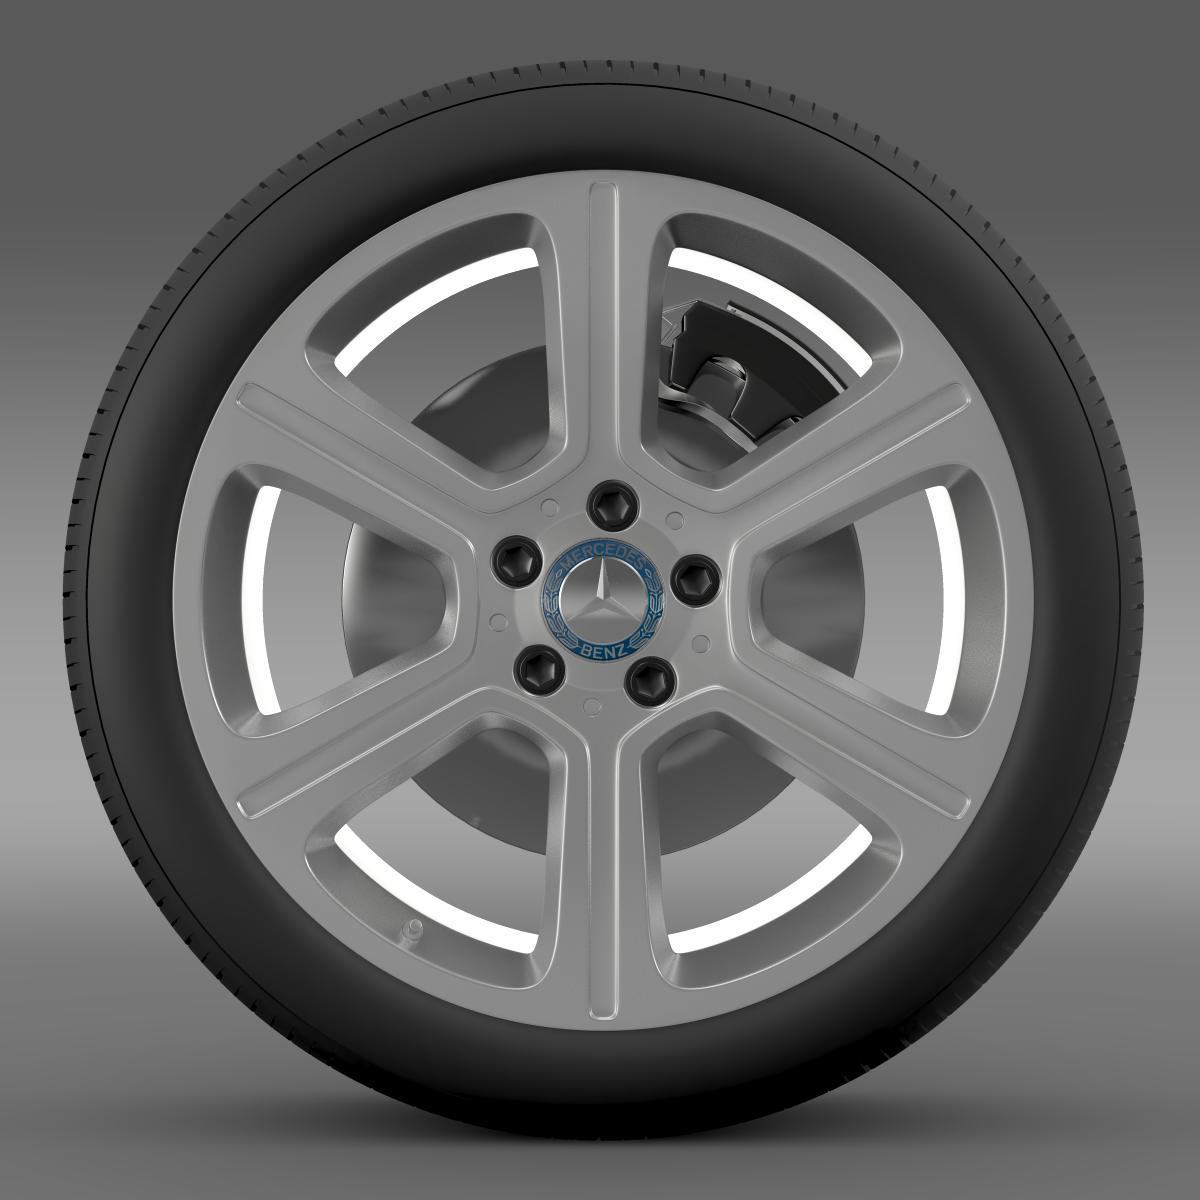 mercedes benz c 300 exclusive line wheel 3d model 3ds max fbx c4d lwo ma mb hrc xsi obj 210771